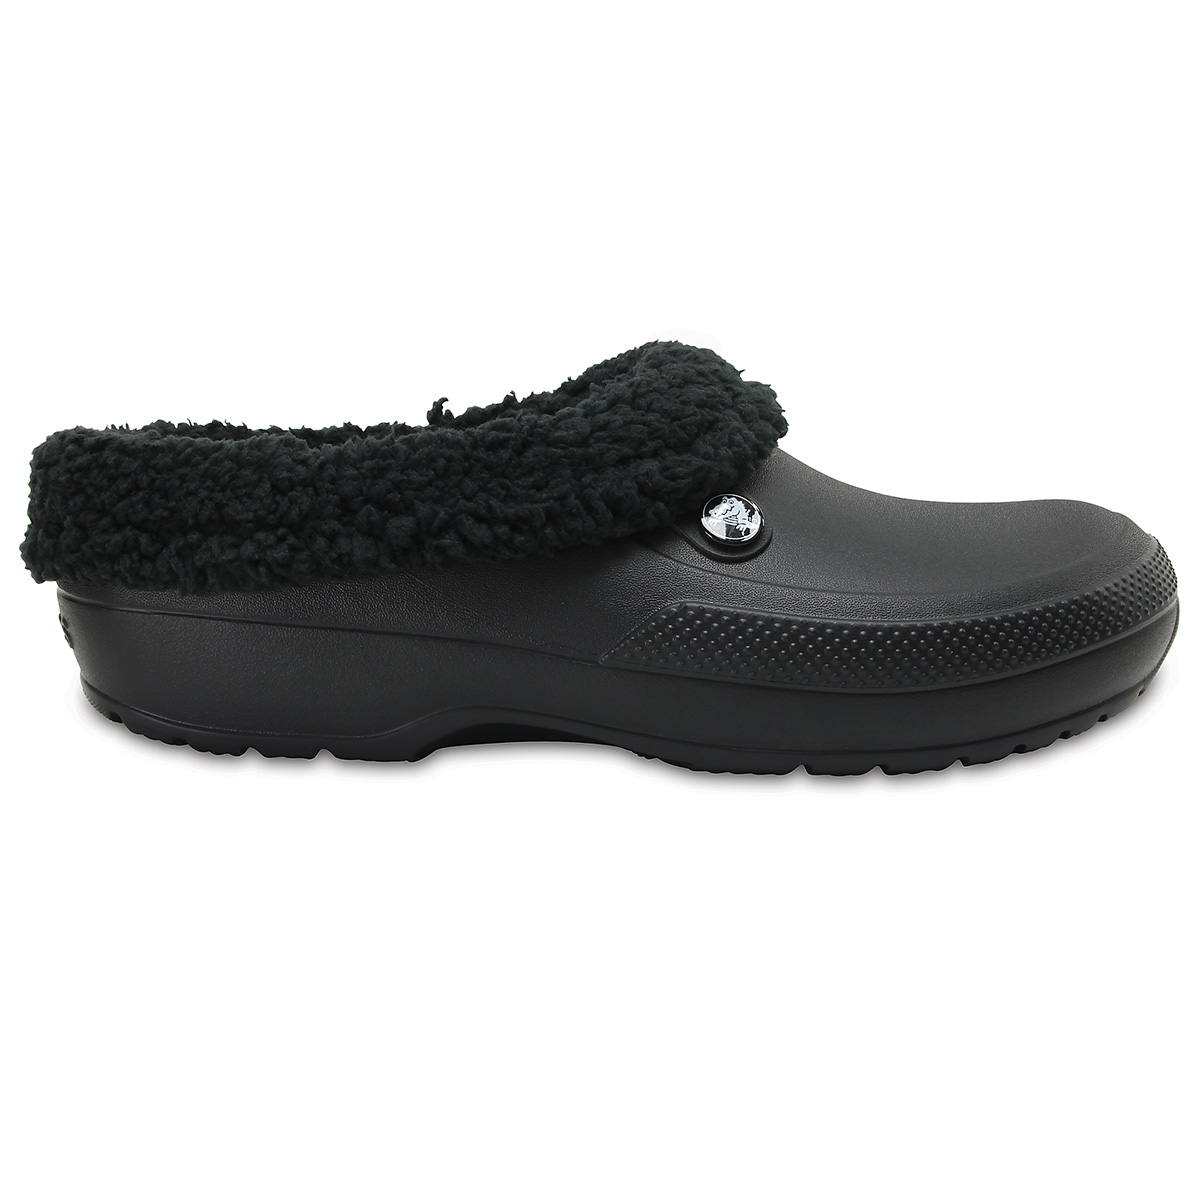 Classic Blitzen III Clog - Siyah/Siyah